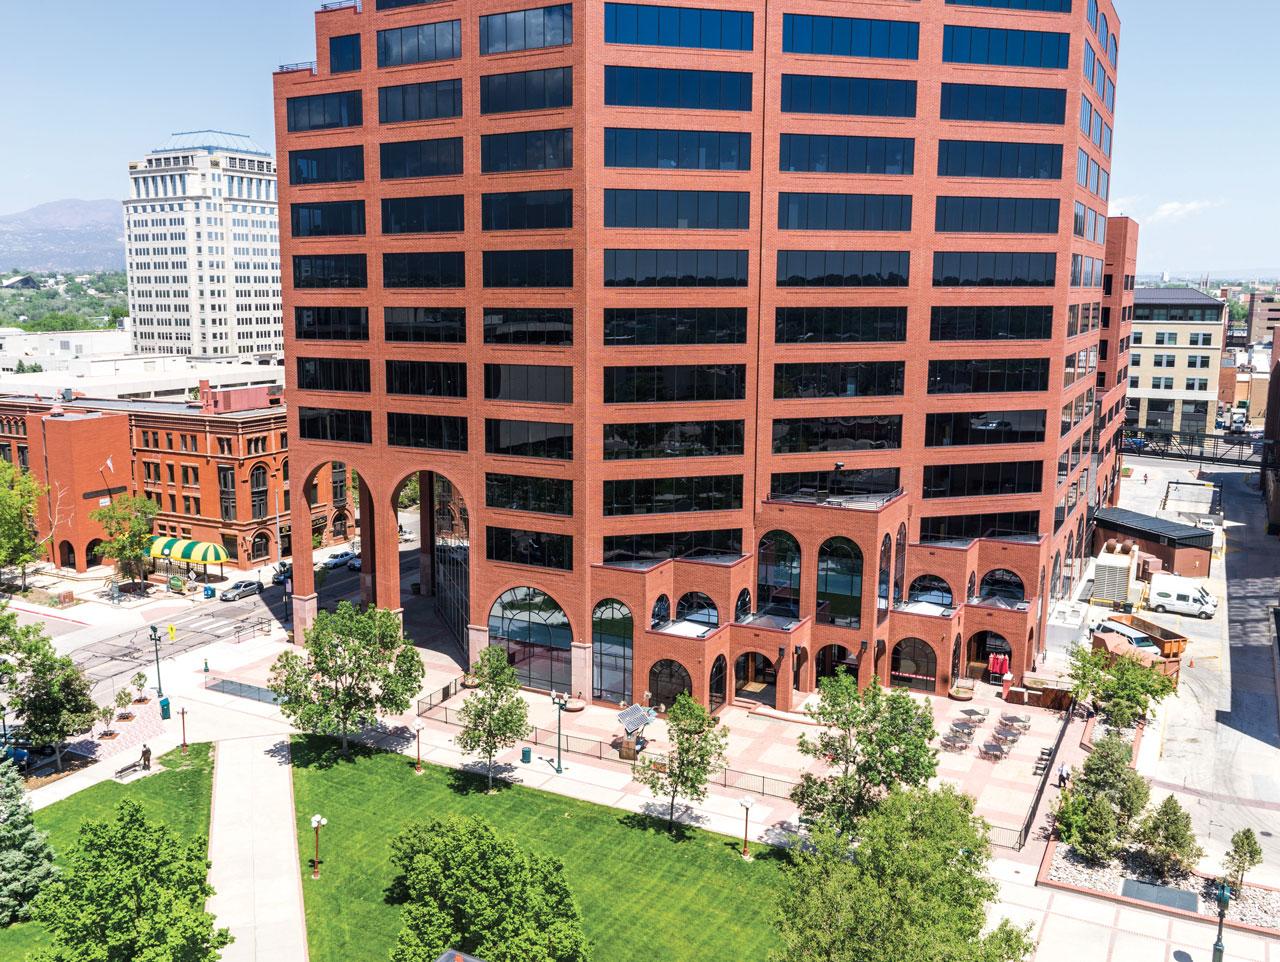 Plaza of the Rockies-Colorado Springs, Colorado   Office Building - 13 Story, 280,000 square feet